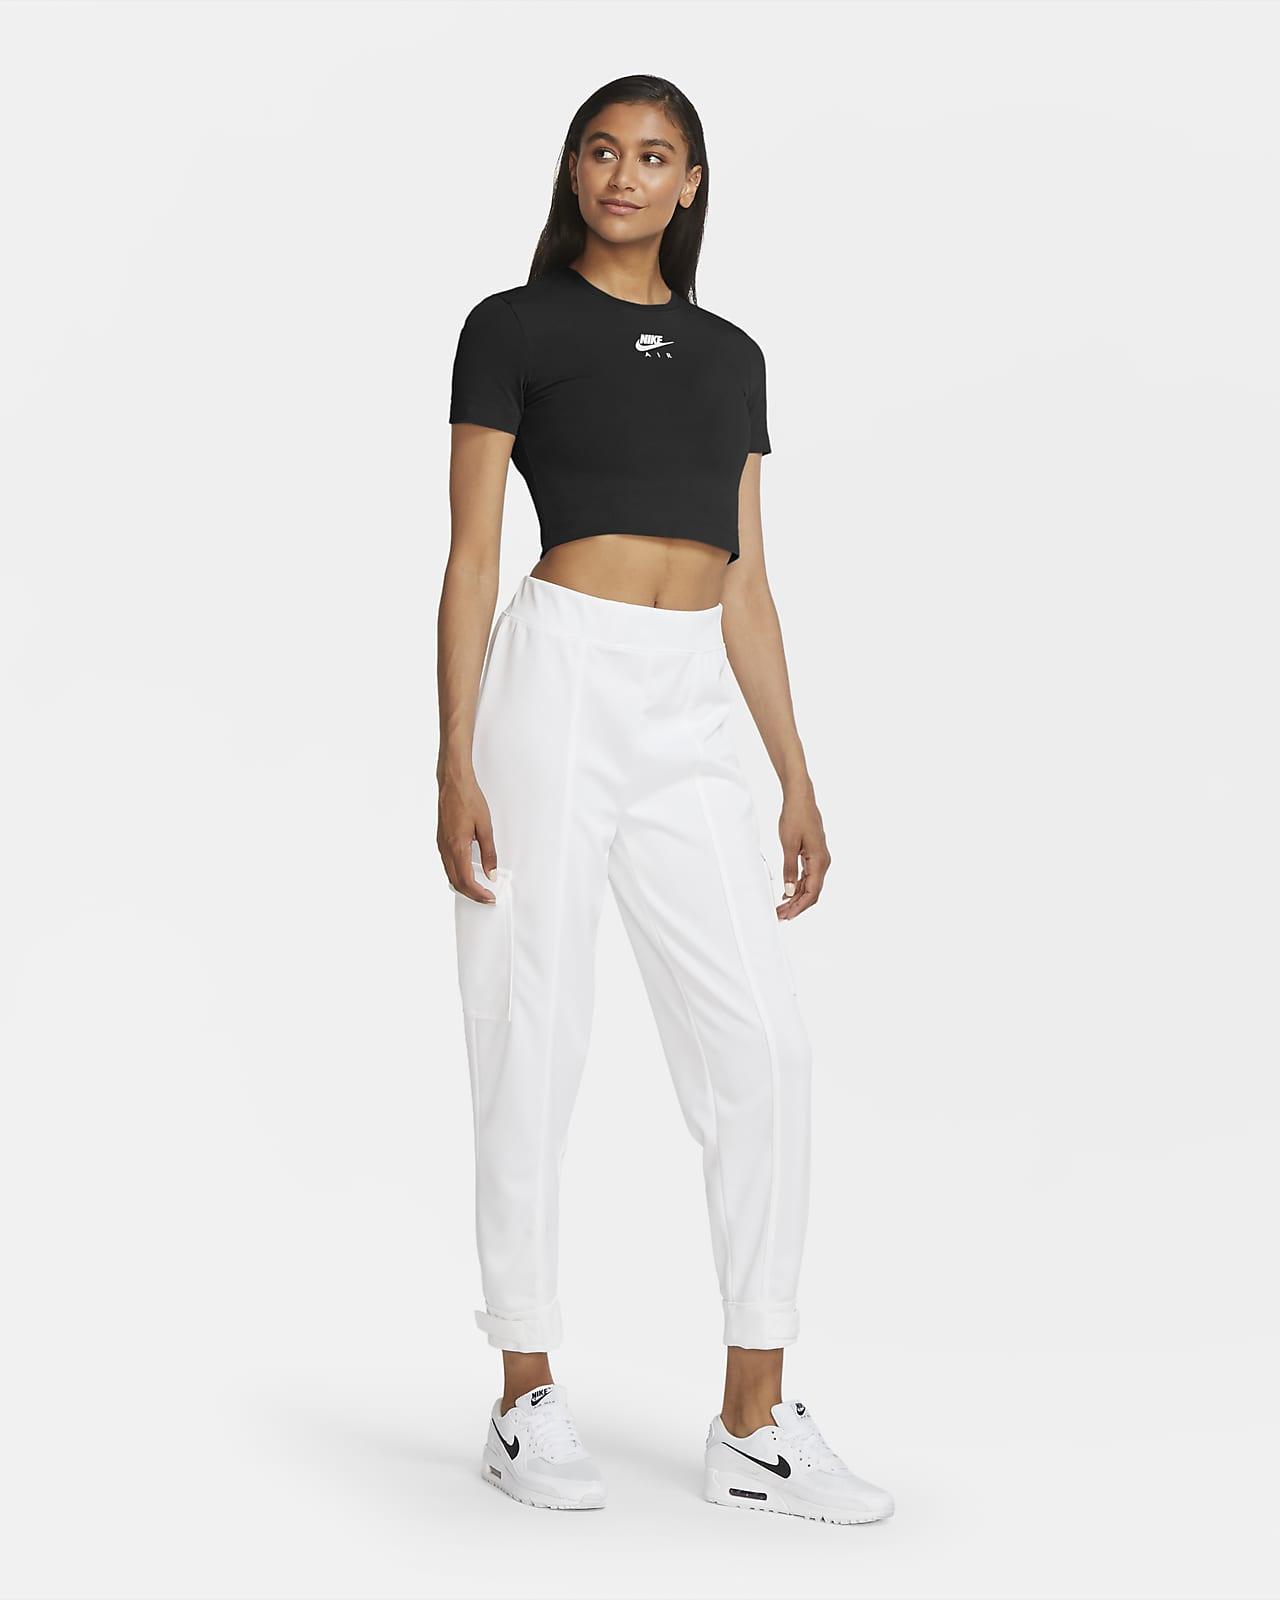 Nike Air Women's Crop Top. Nike GB